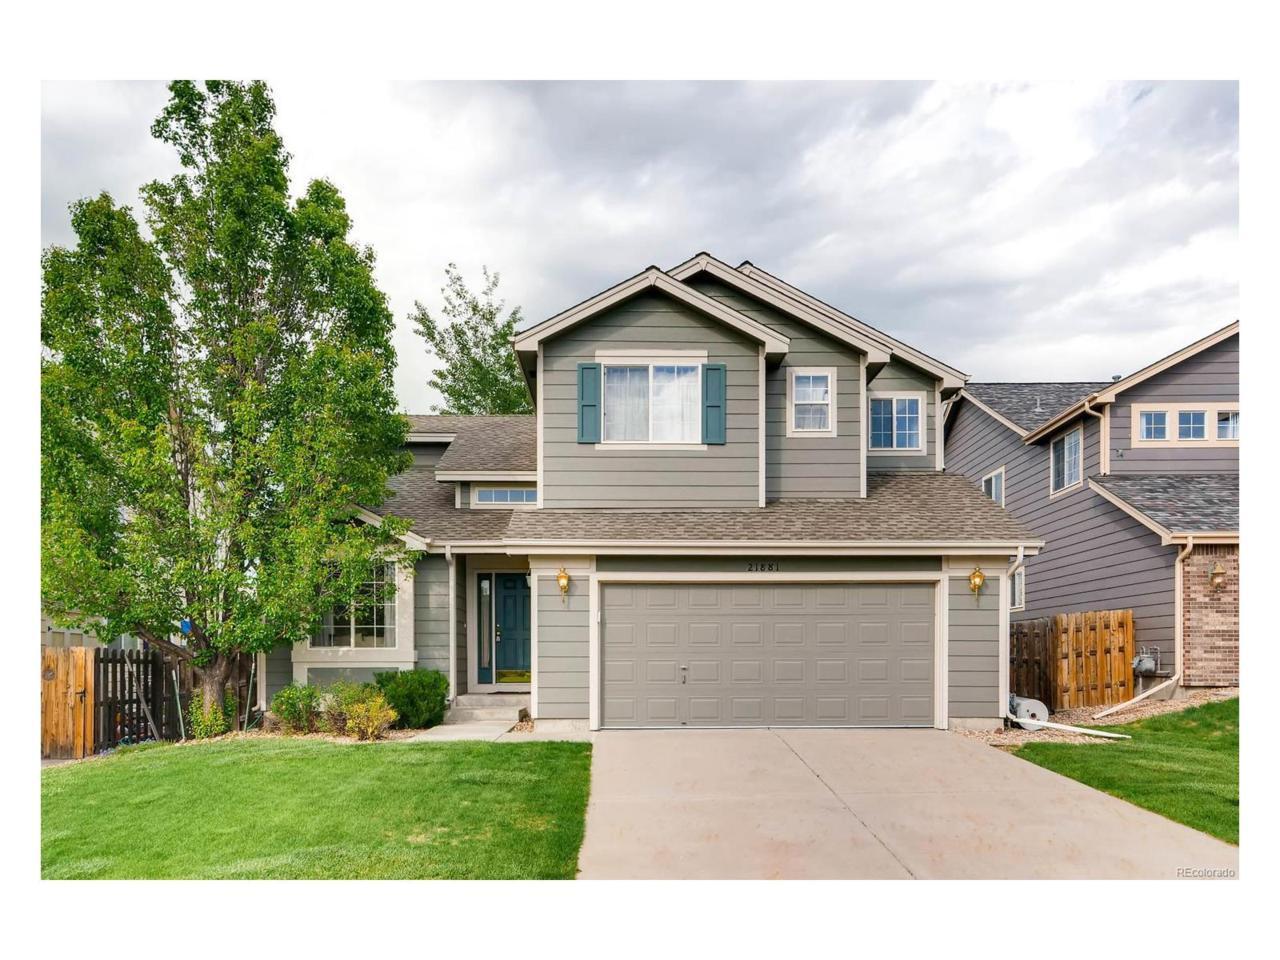 21881 E Berry Lane, Centennial, CO 80015 (MLS #5375883) :: 8z Real Estate